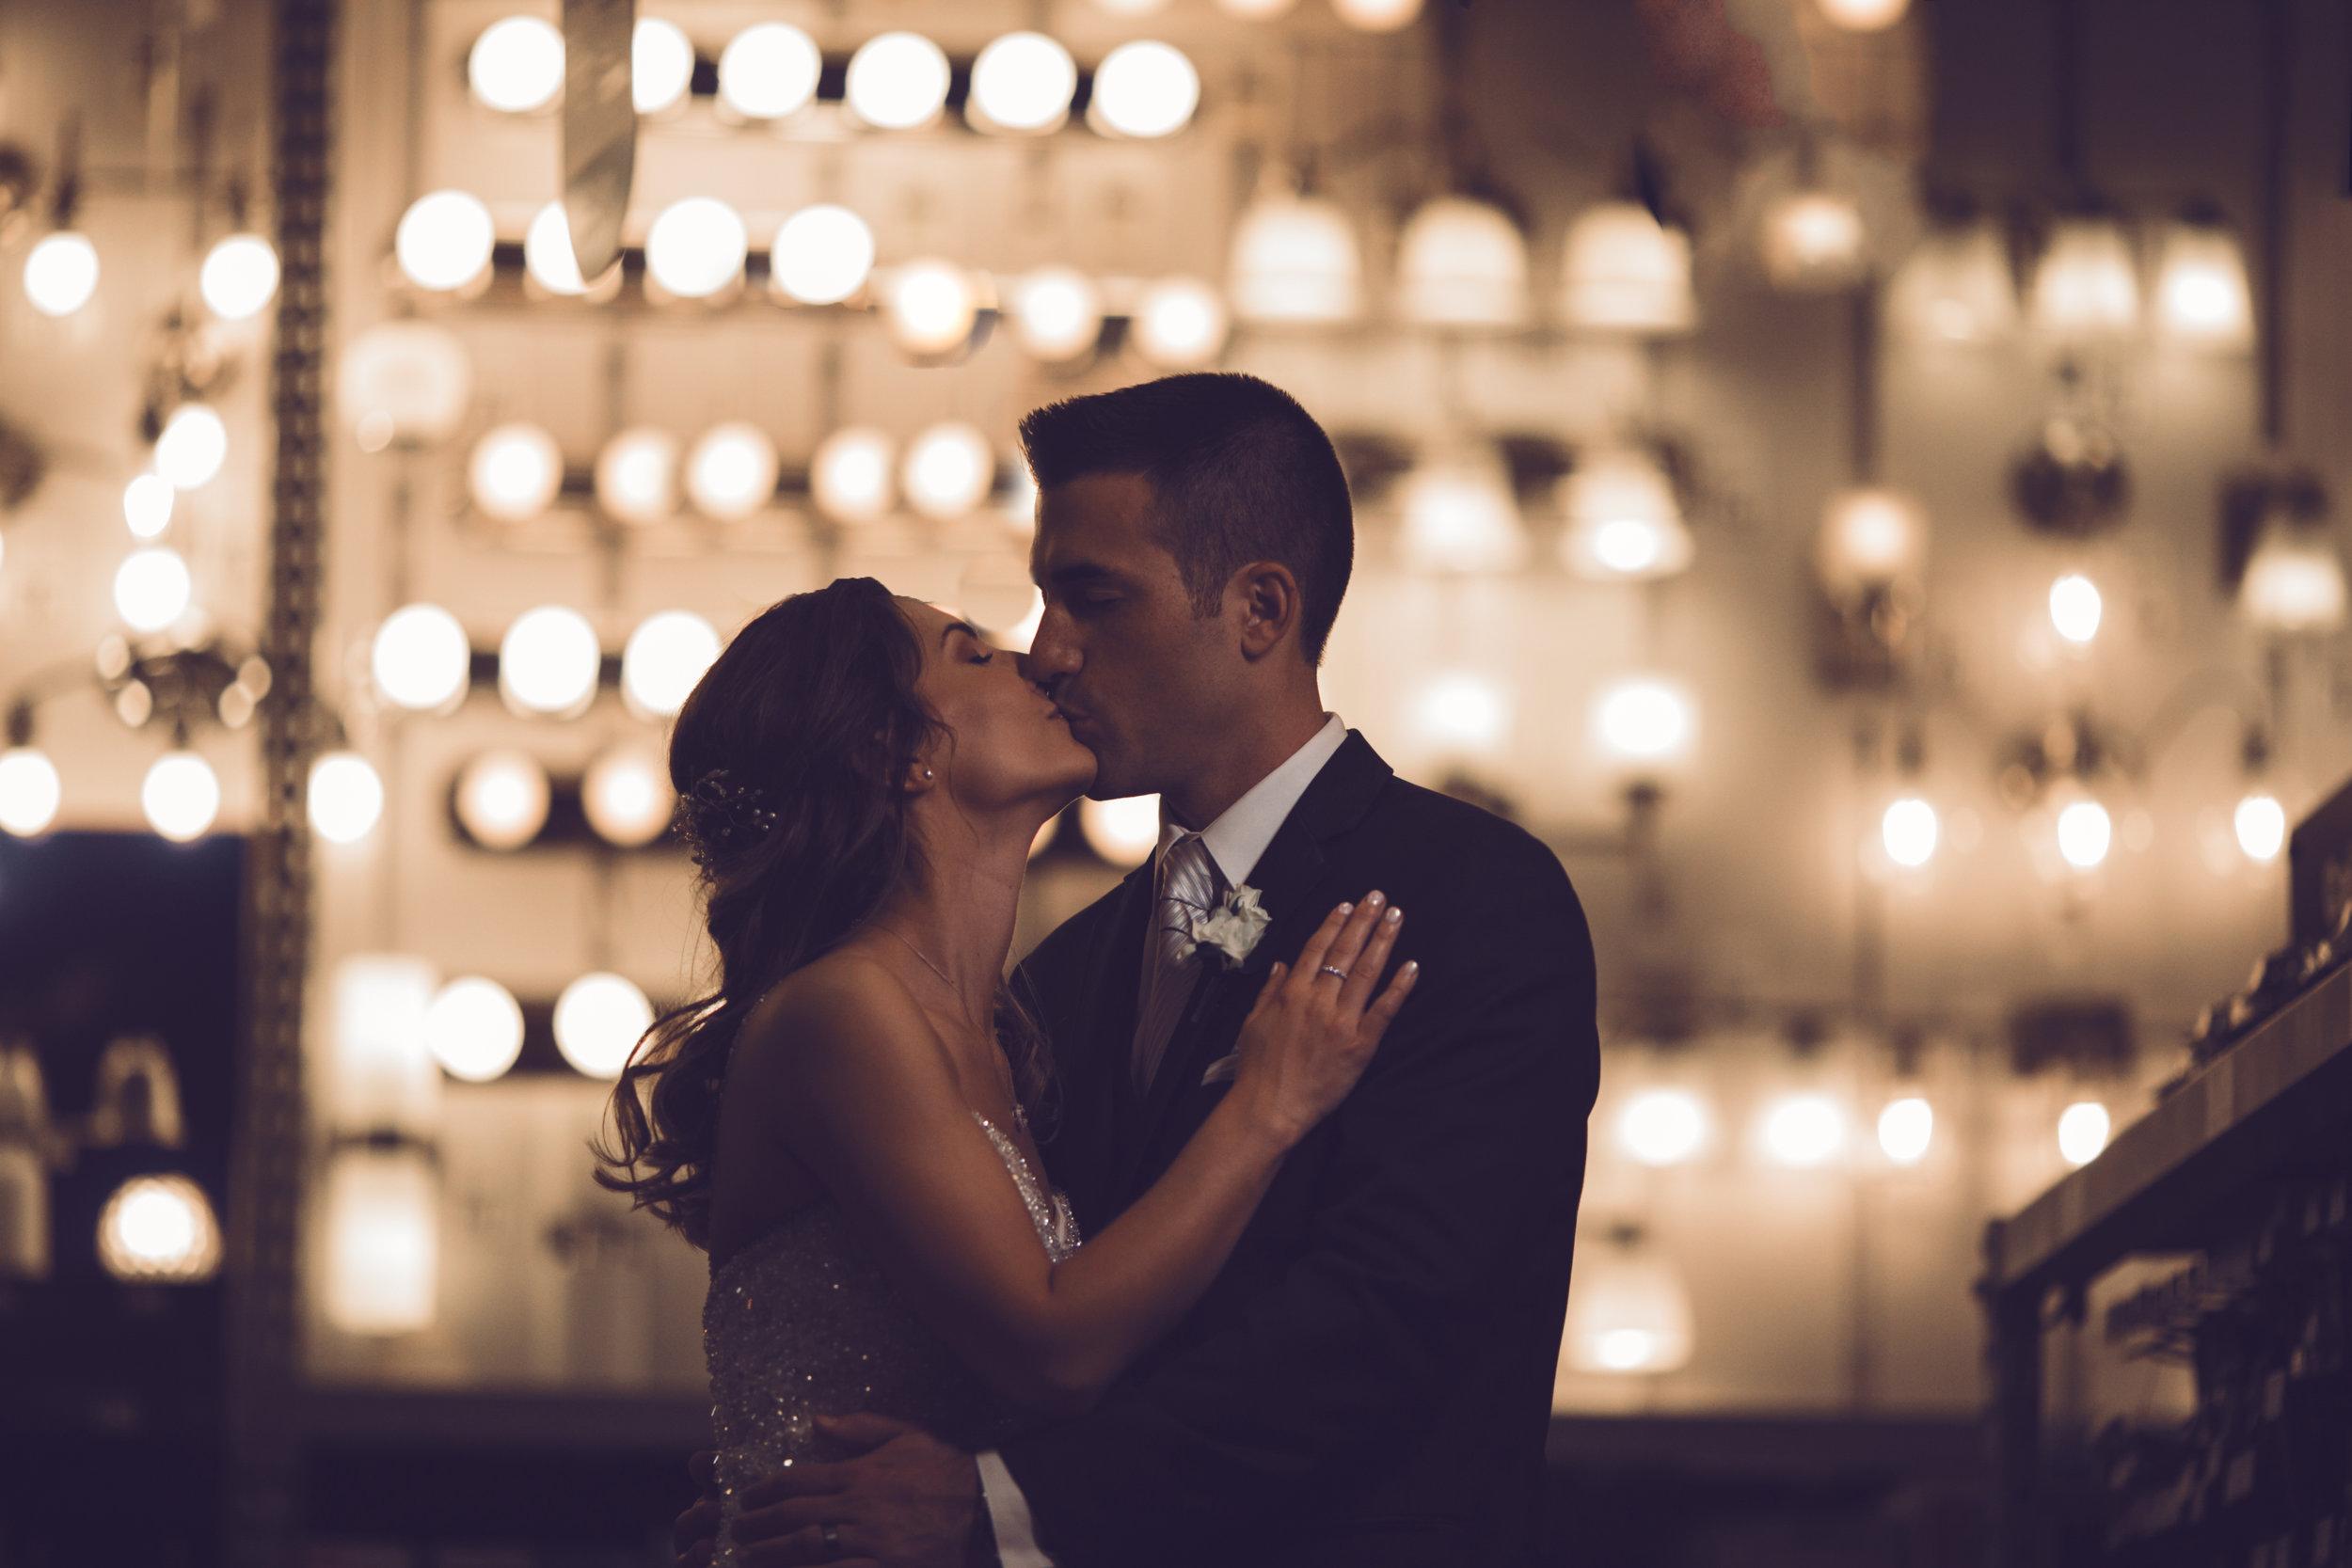 Wedding-couple-takes-photos-at-lowes-hardware-due-to-rain43.jpg